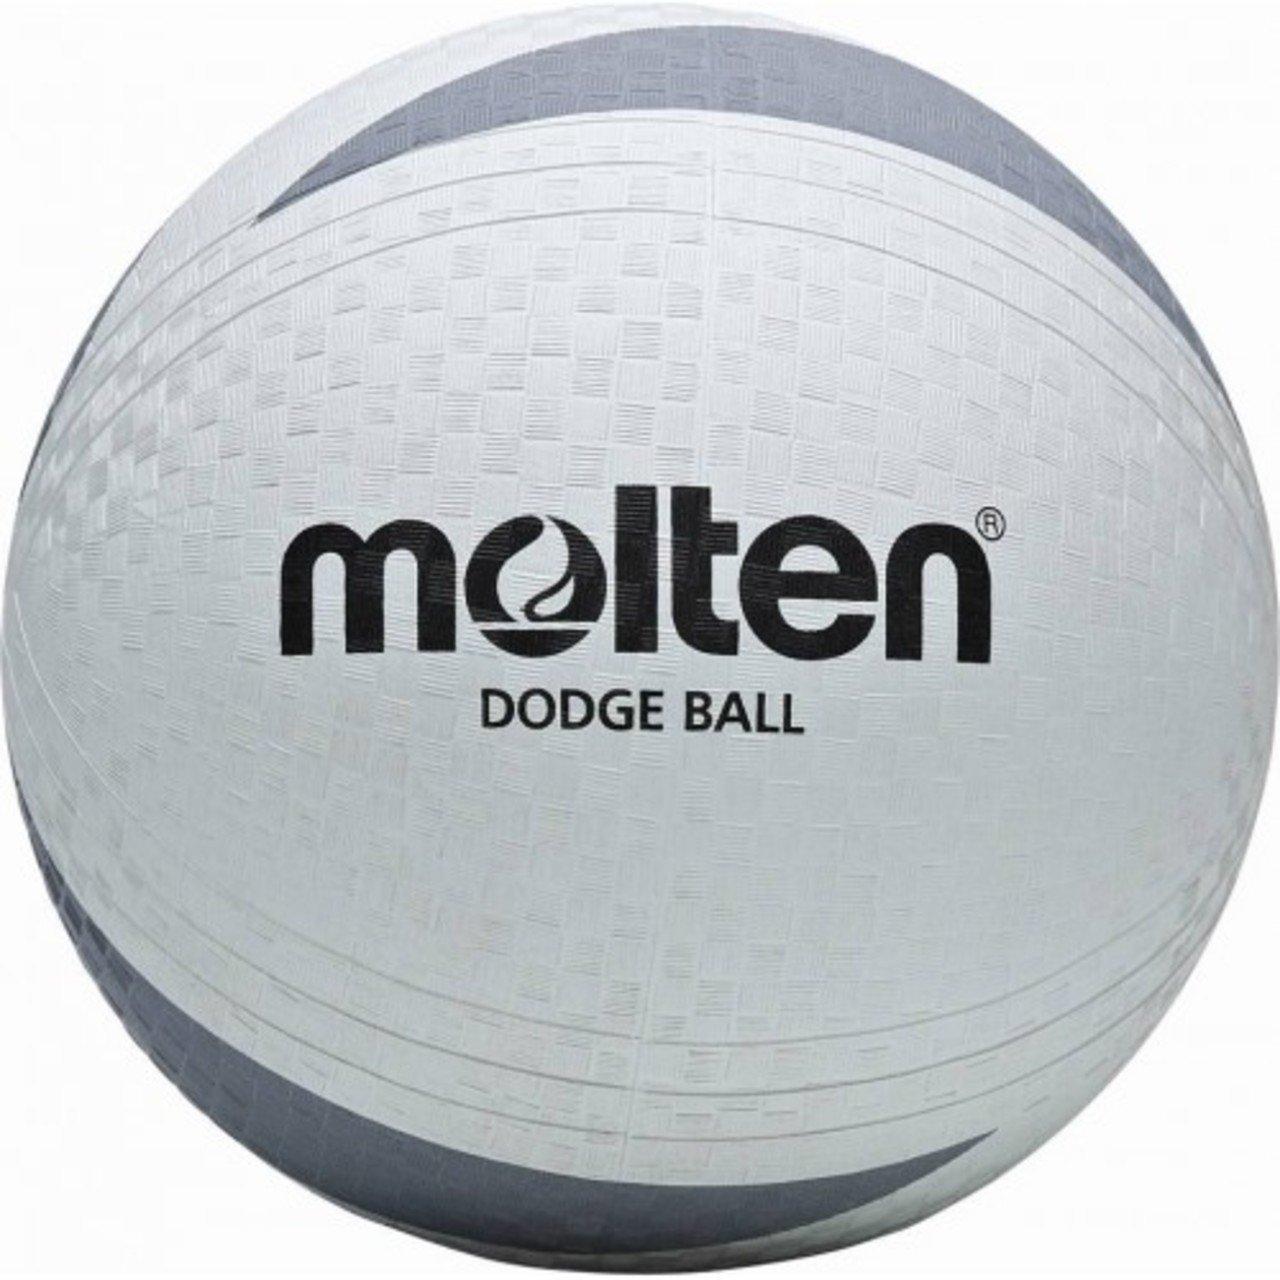 Molten Indoor/outdoor Sport Play Handball Soft Touch School Game Dodgeball White